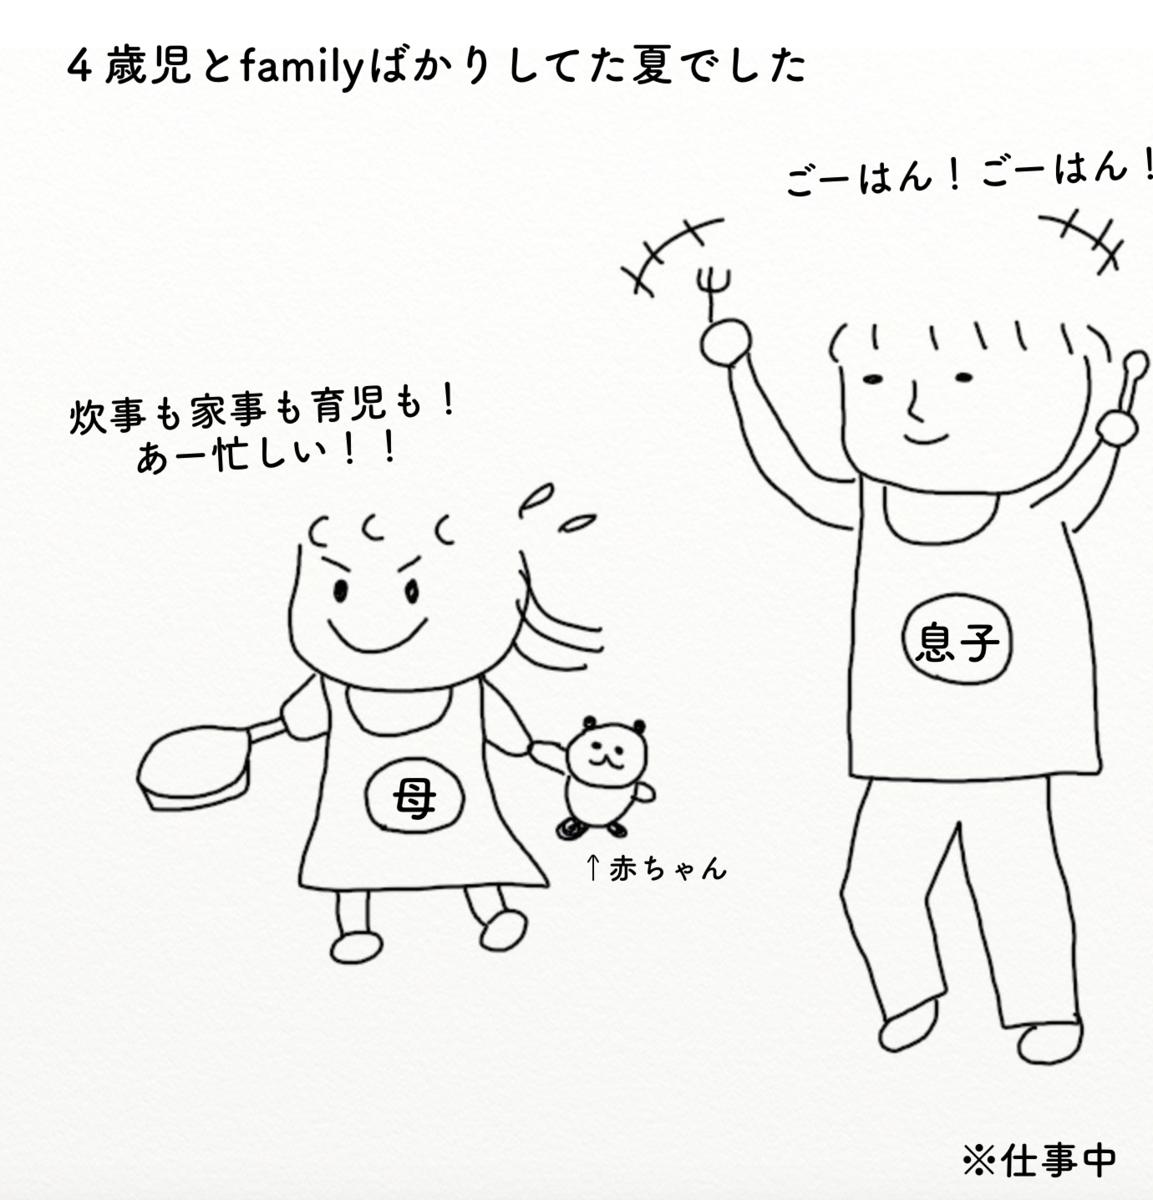 f:id:familybusiness:20190909225812p:plain